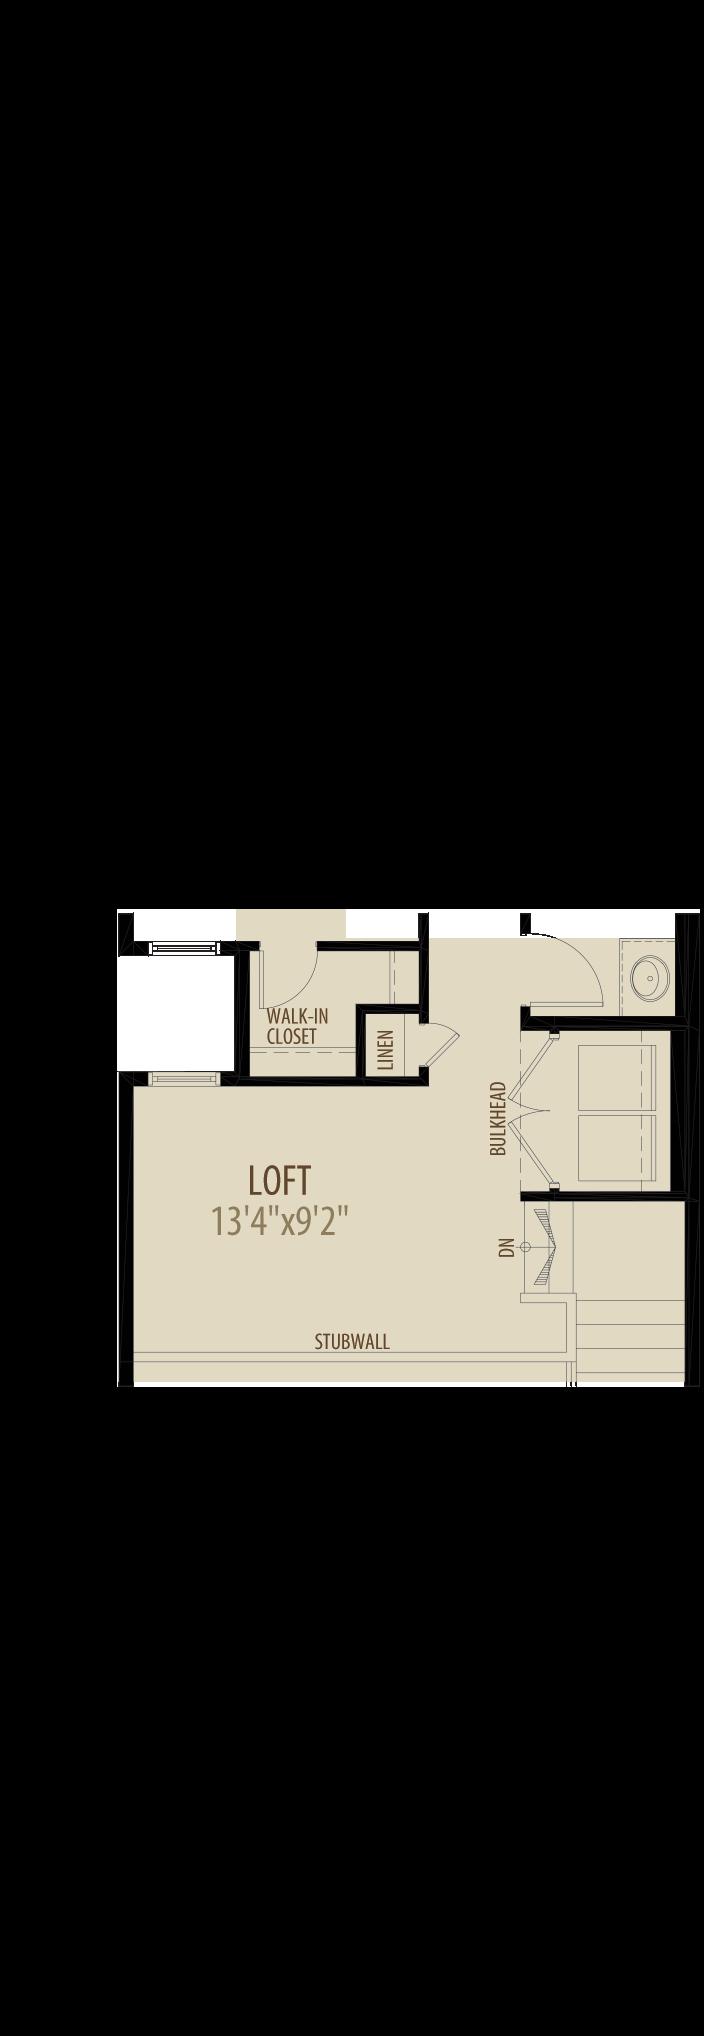 Option 8 Loft